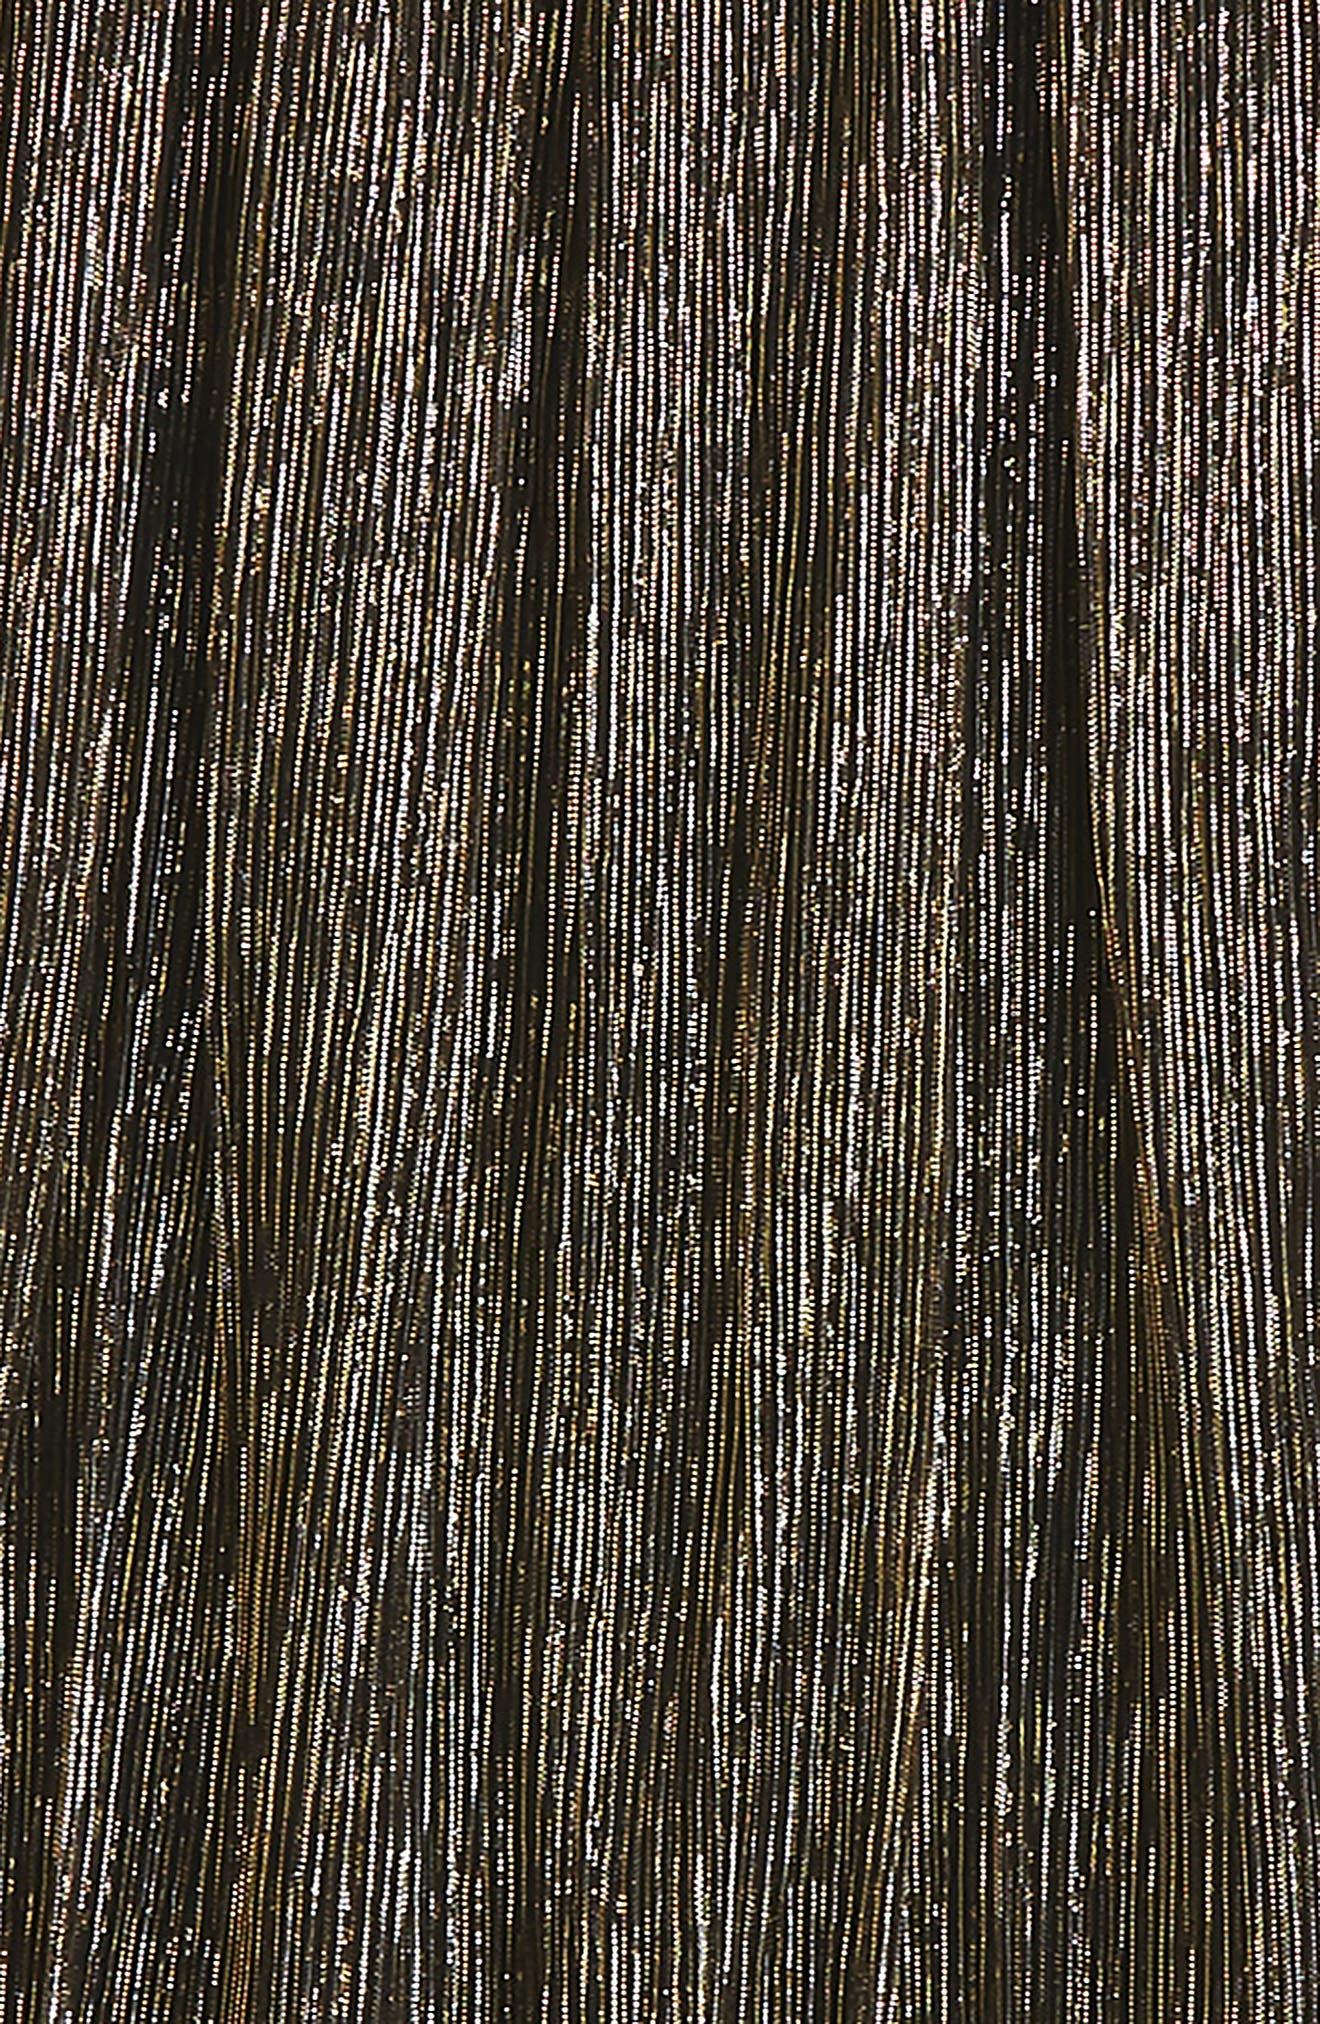 Pleated Metallic Skirt,                             Alternate thumbnail 2, color,                             710